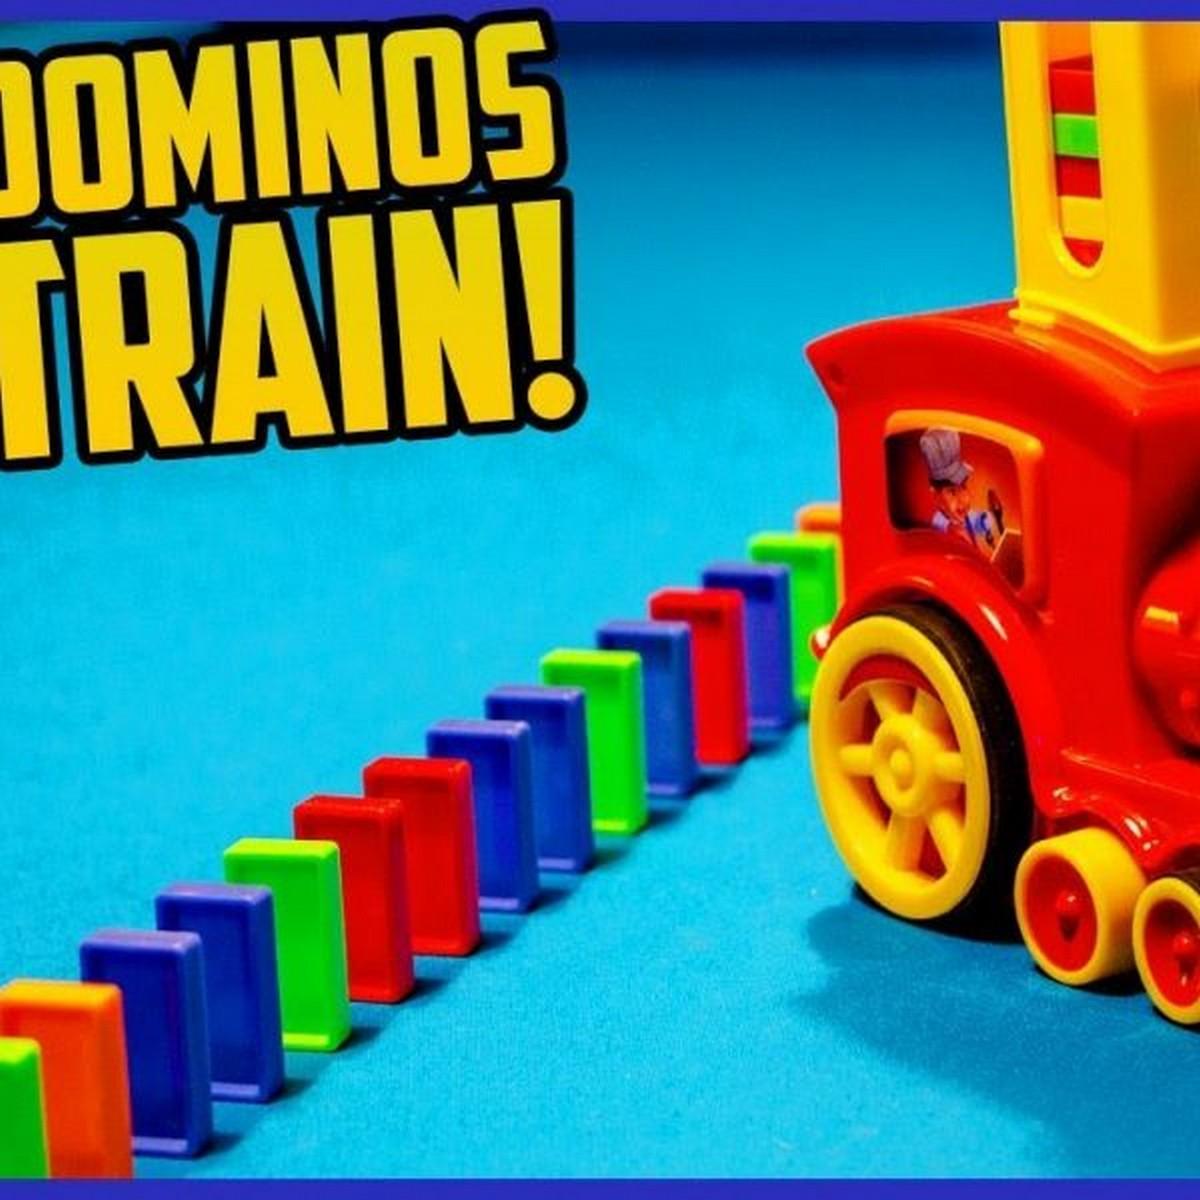 Domino Train Toy